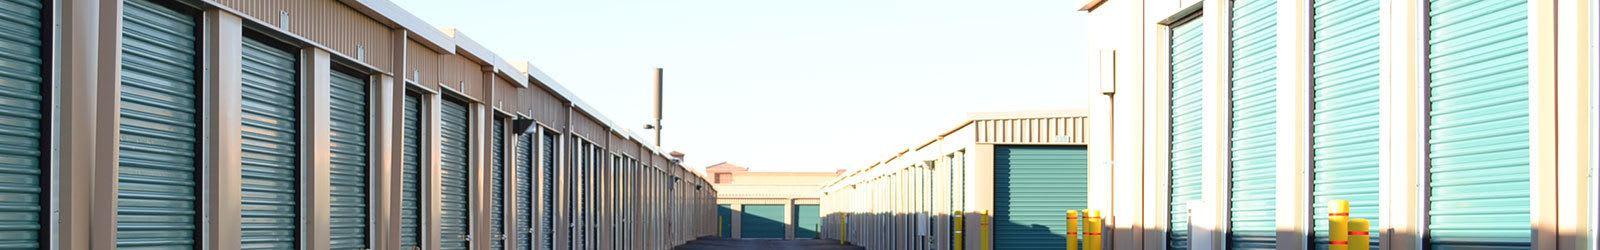 Self storage in Albuquerque, NM provides secure units.